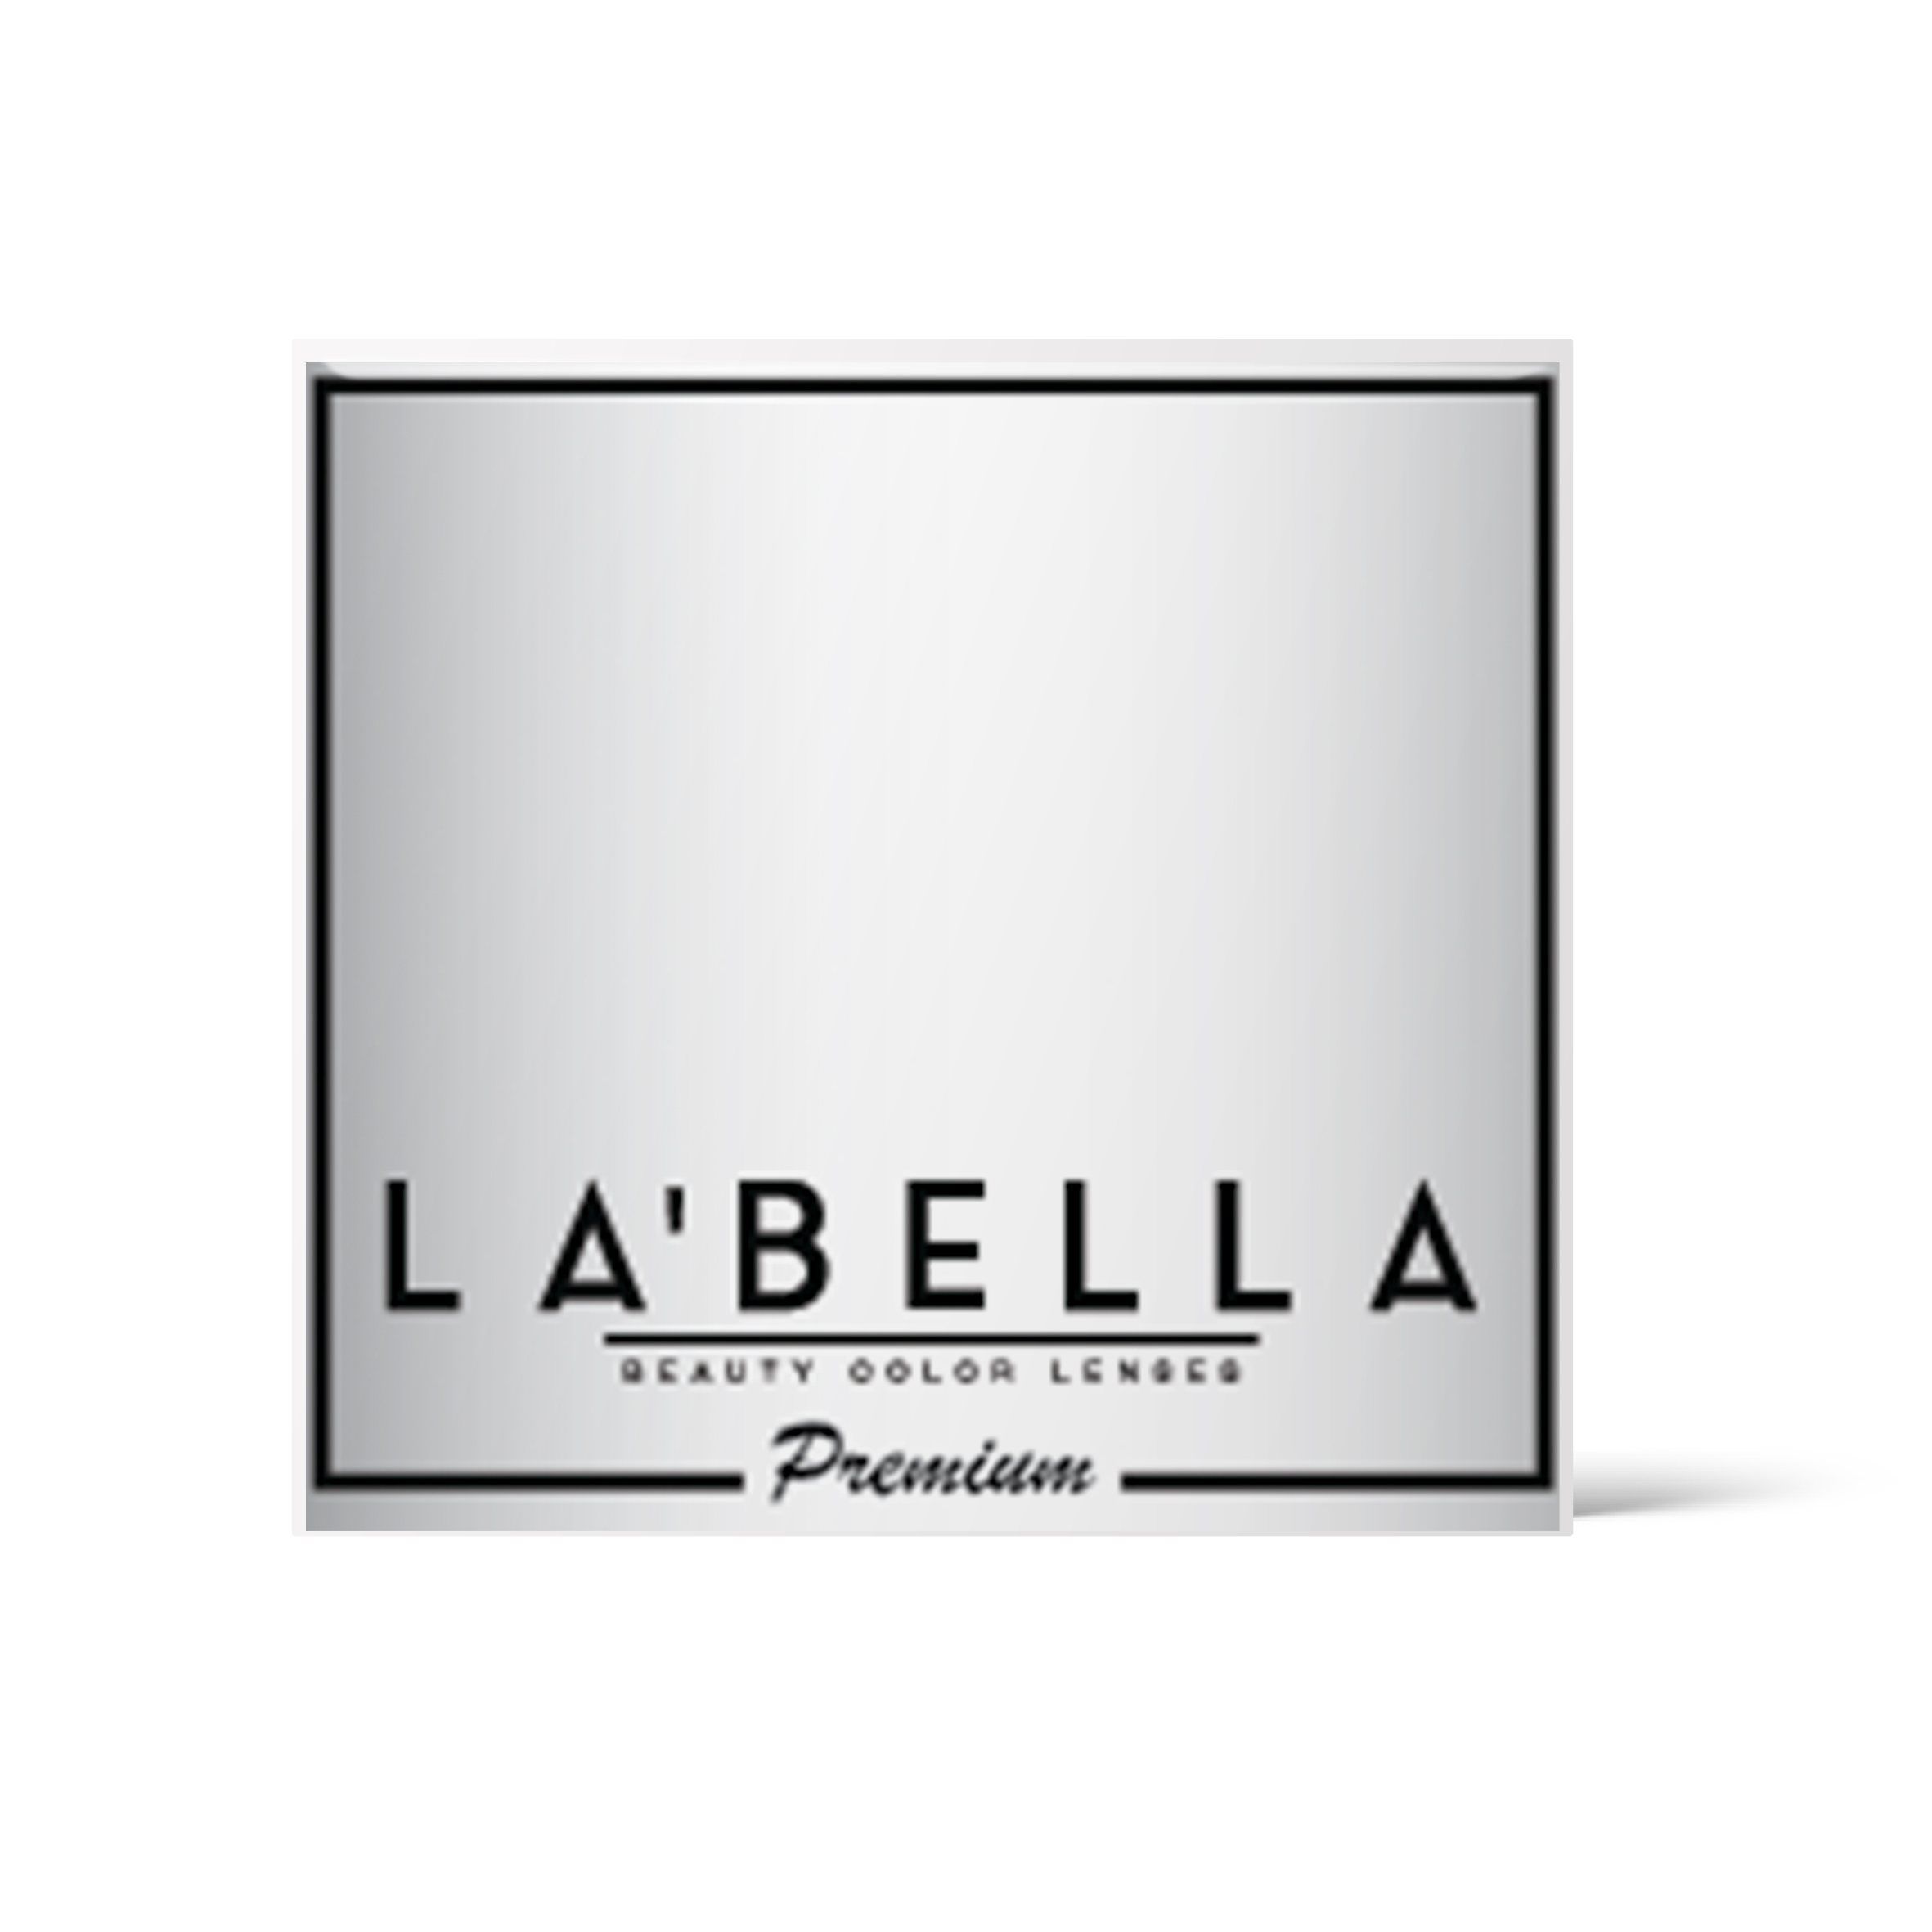 Labella Premium Seri Numarasız